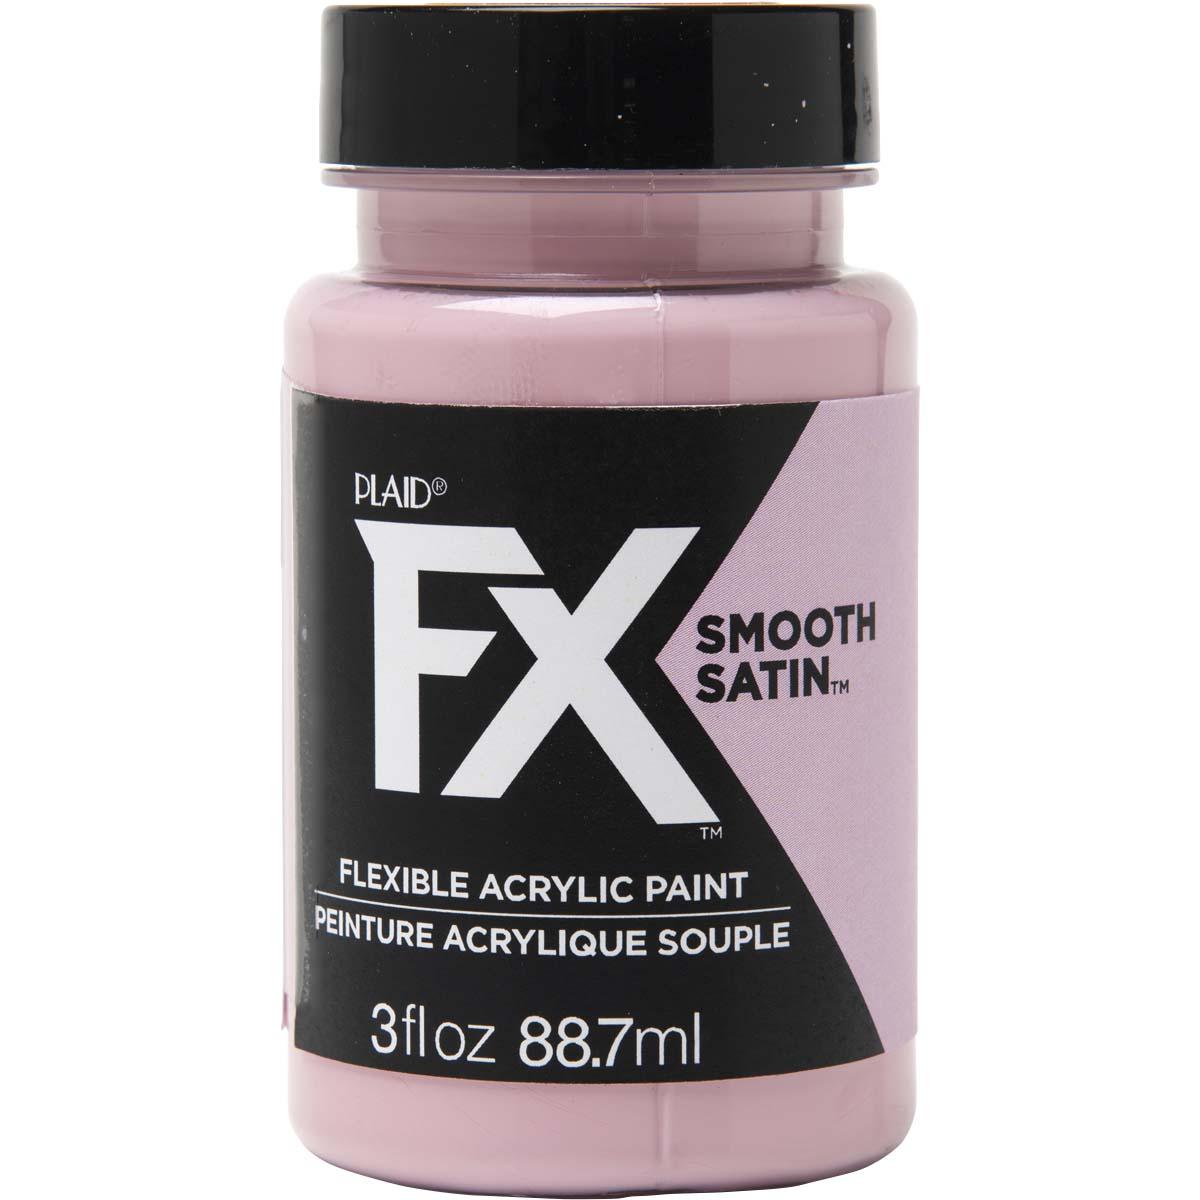 PlaidFX Smooth Satin Flexible Acrylic Paint - Tickled Pink, 3 oz. - 36838